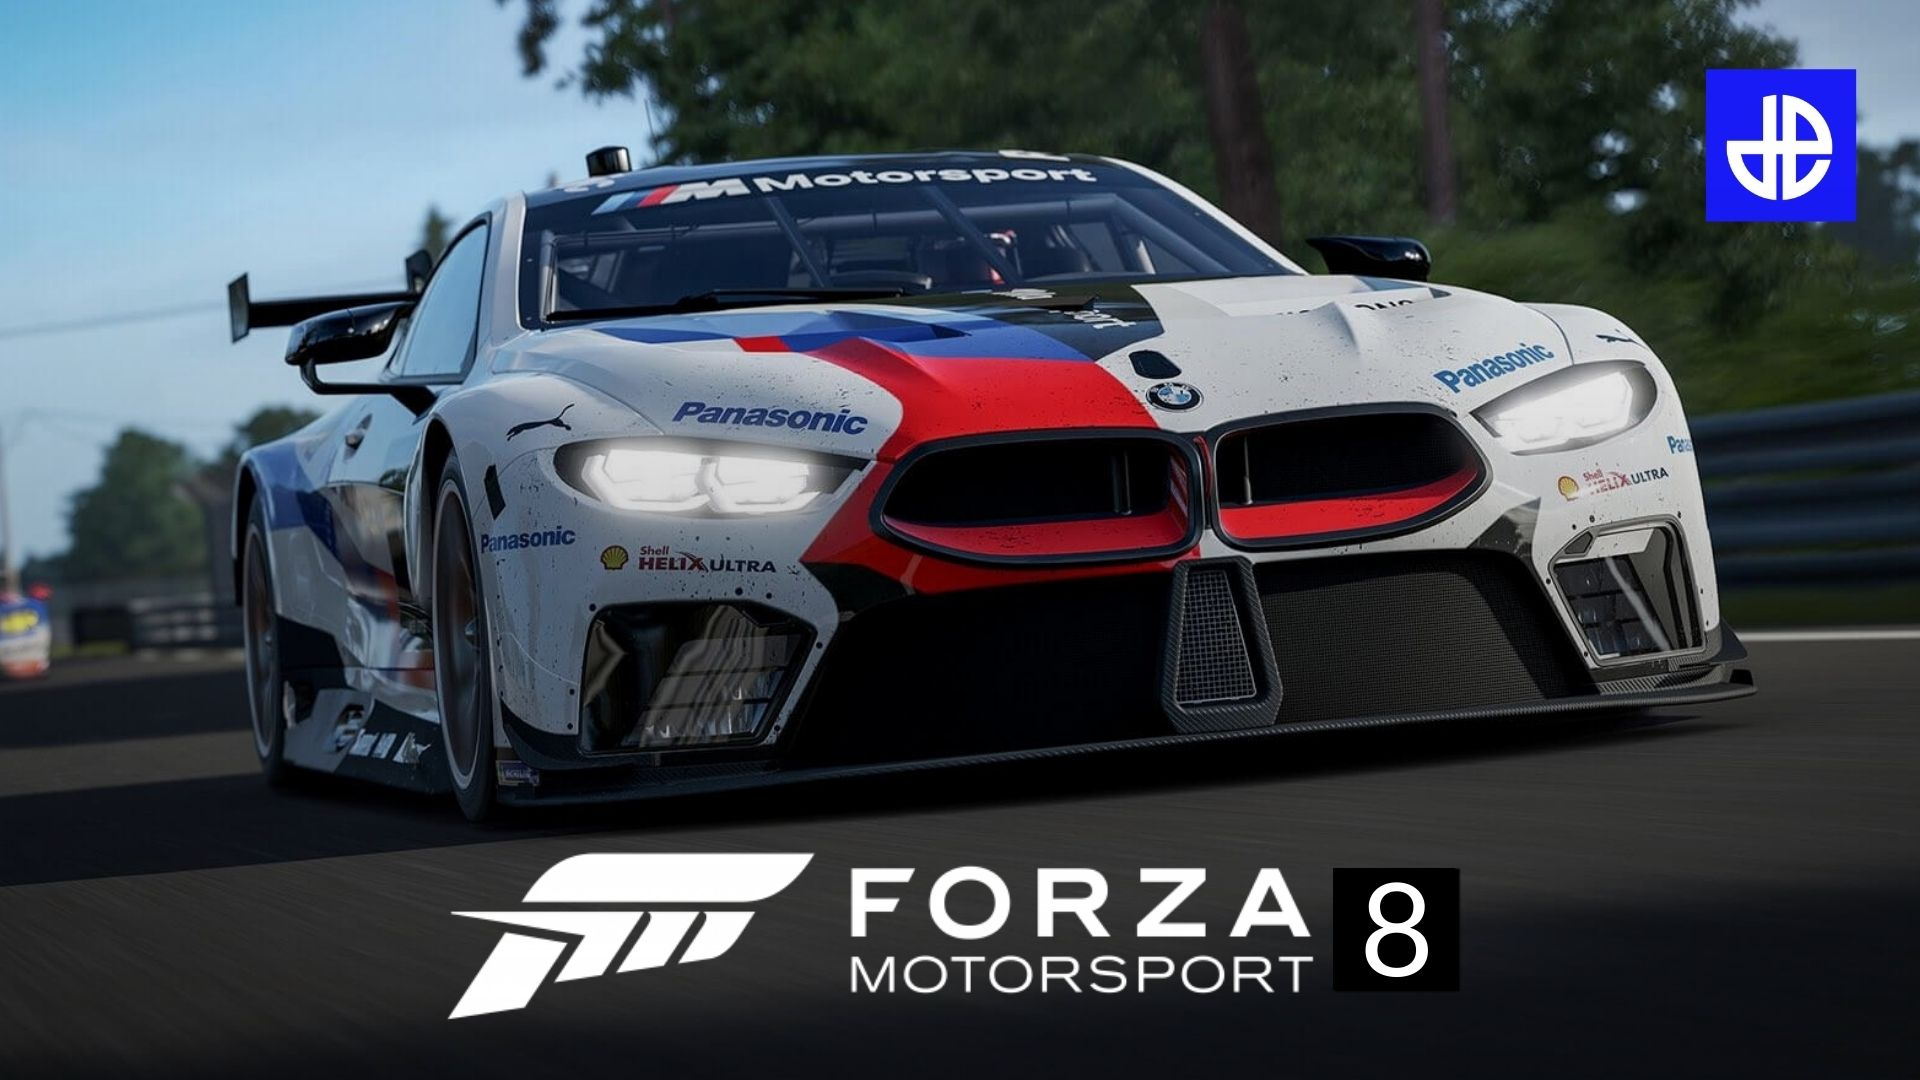 Forza 8 vehicle